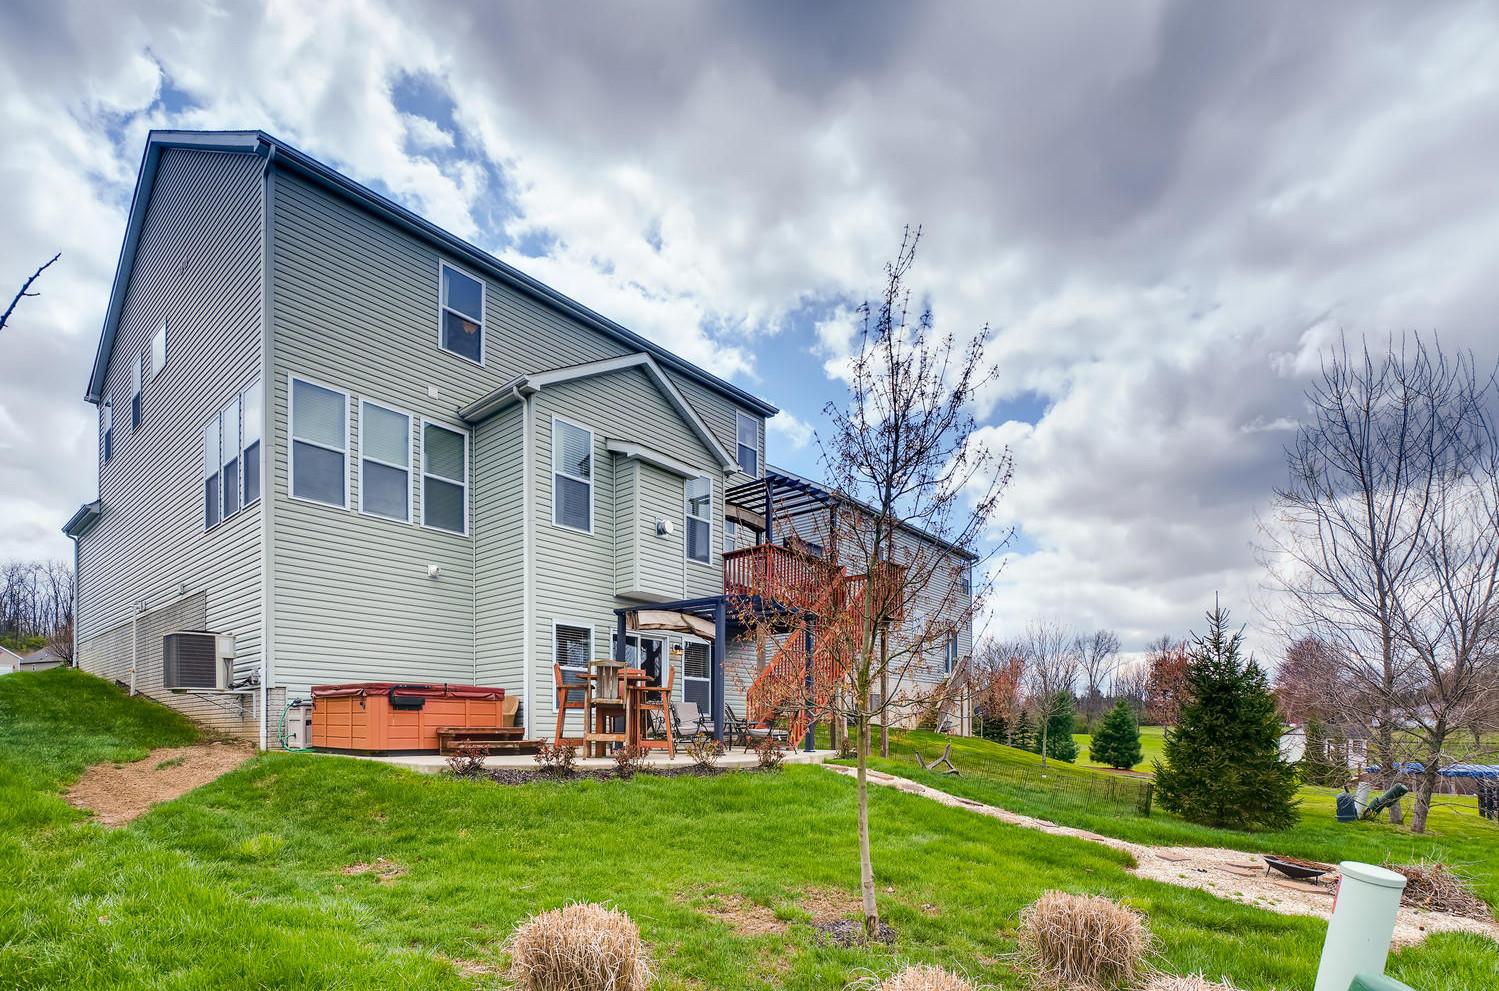 375 W Twin Maple Ave, Lithopolis, OH 43136